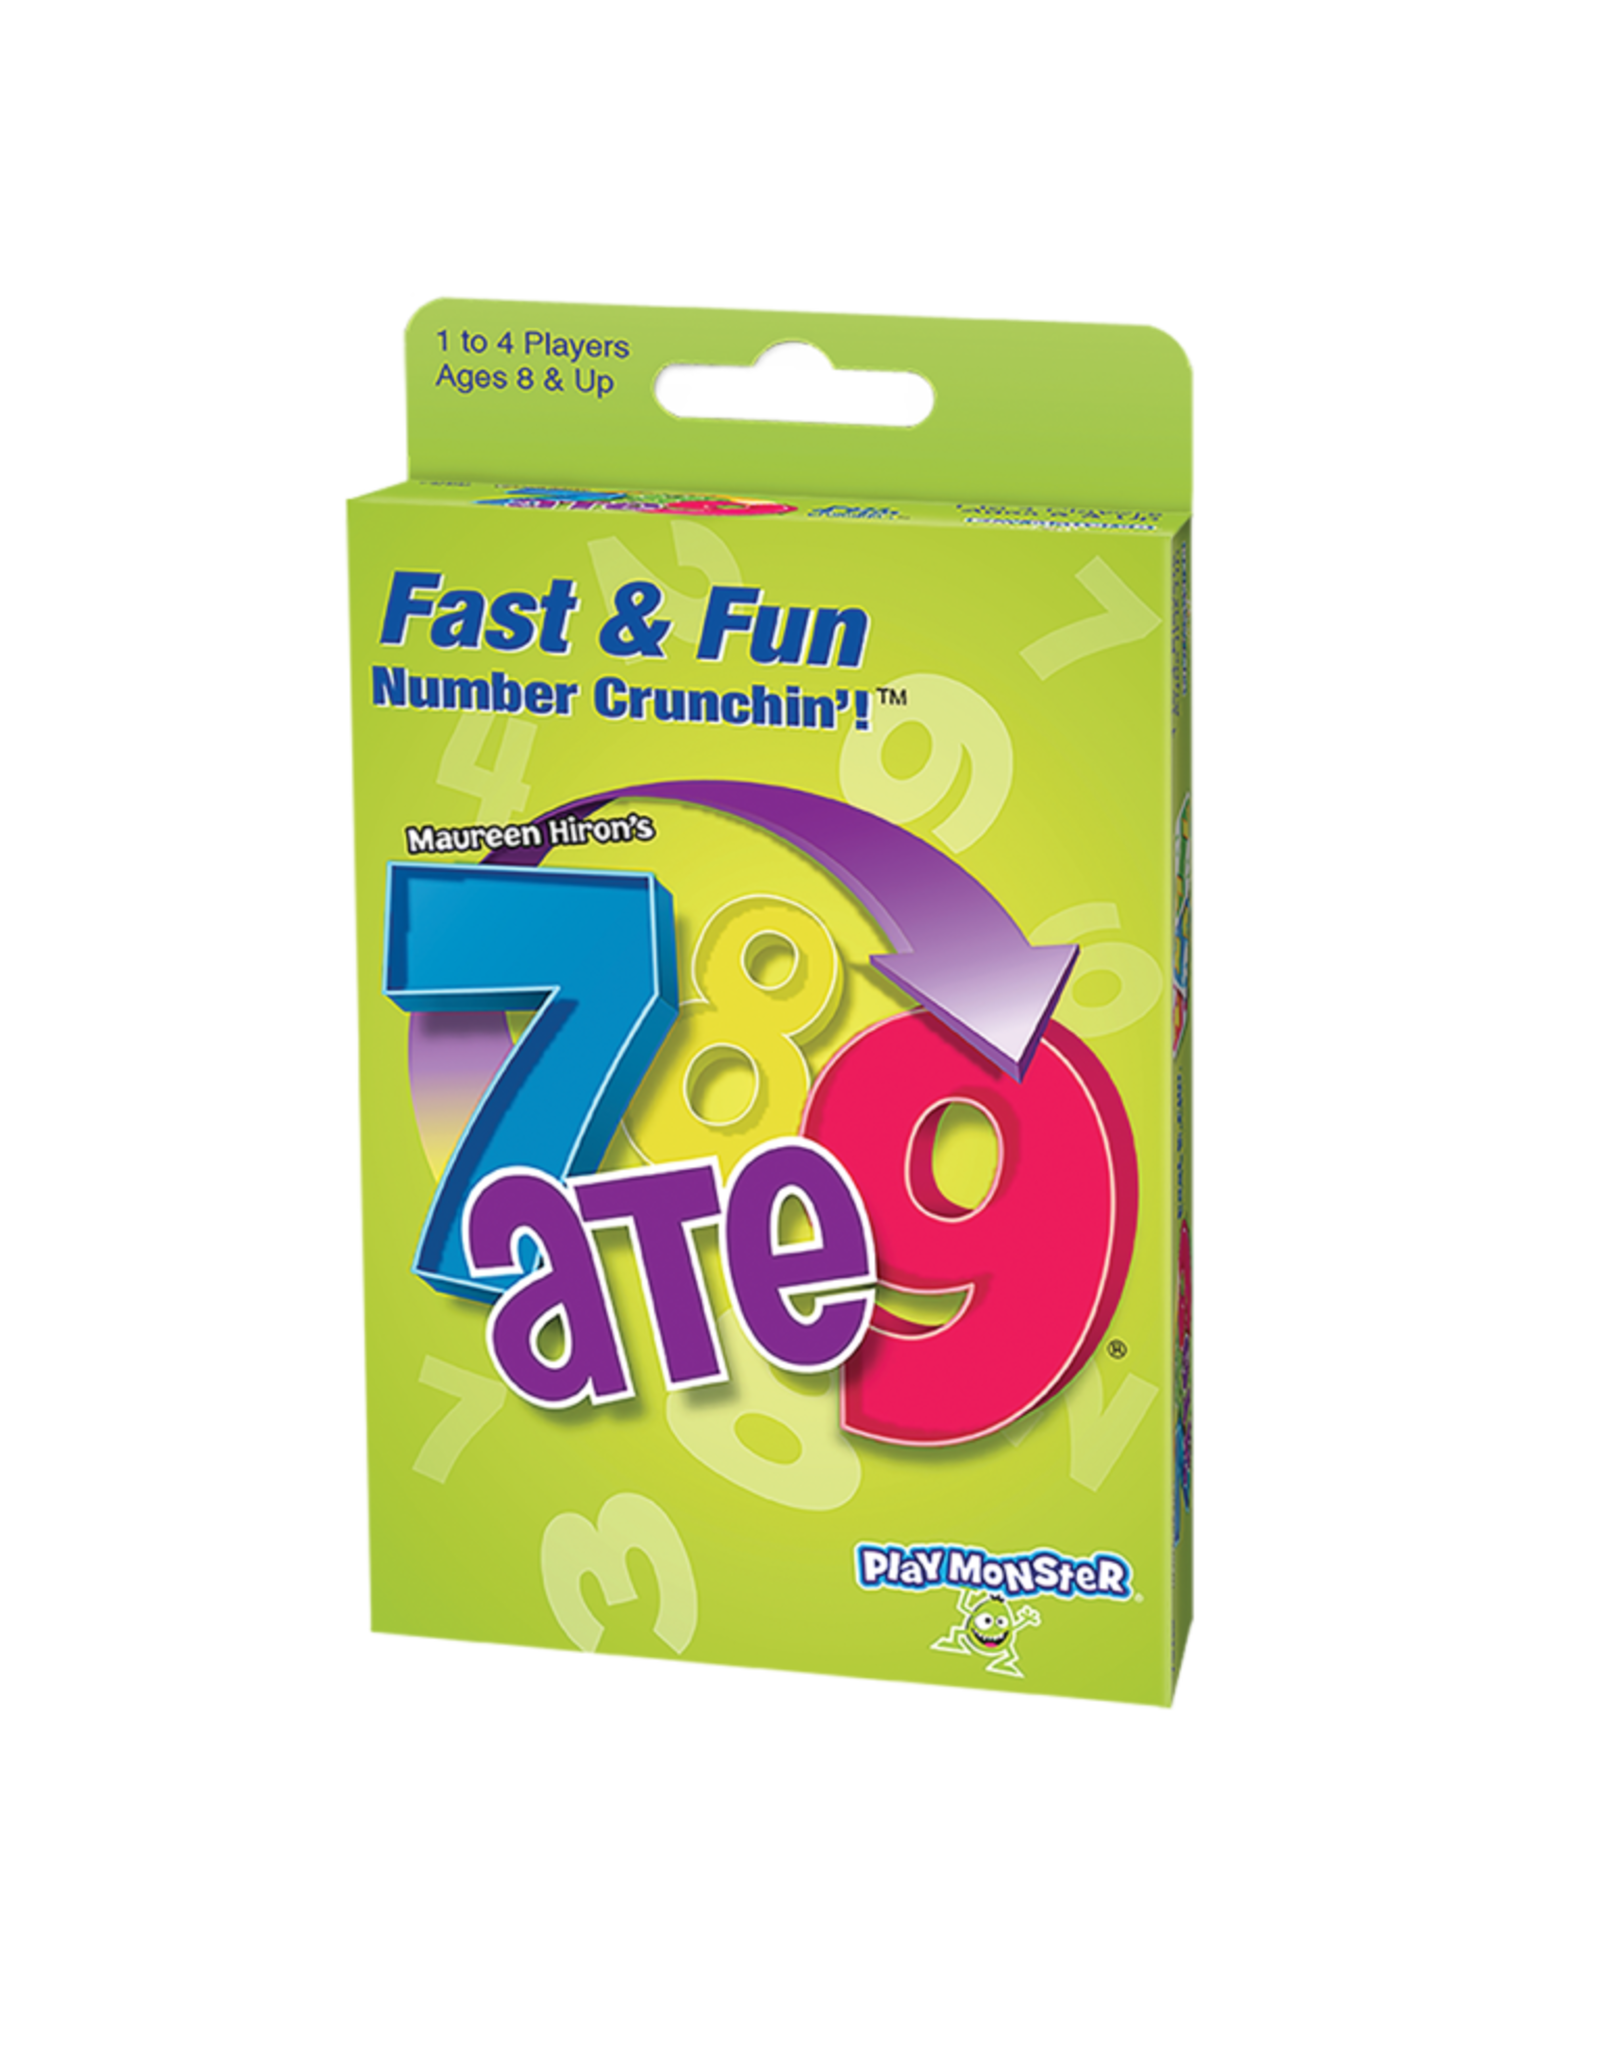 playmonster 7 ATE 9 card game